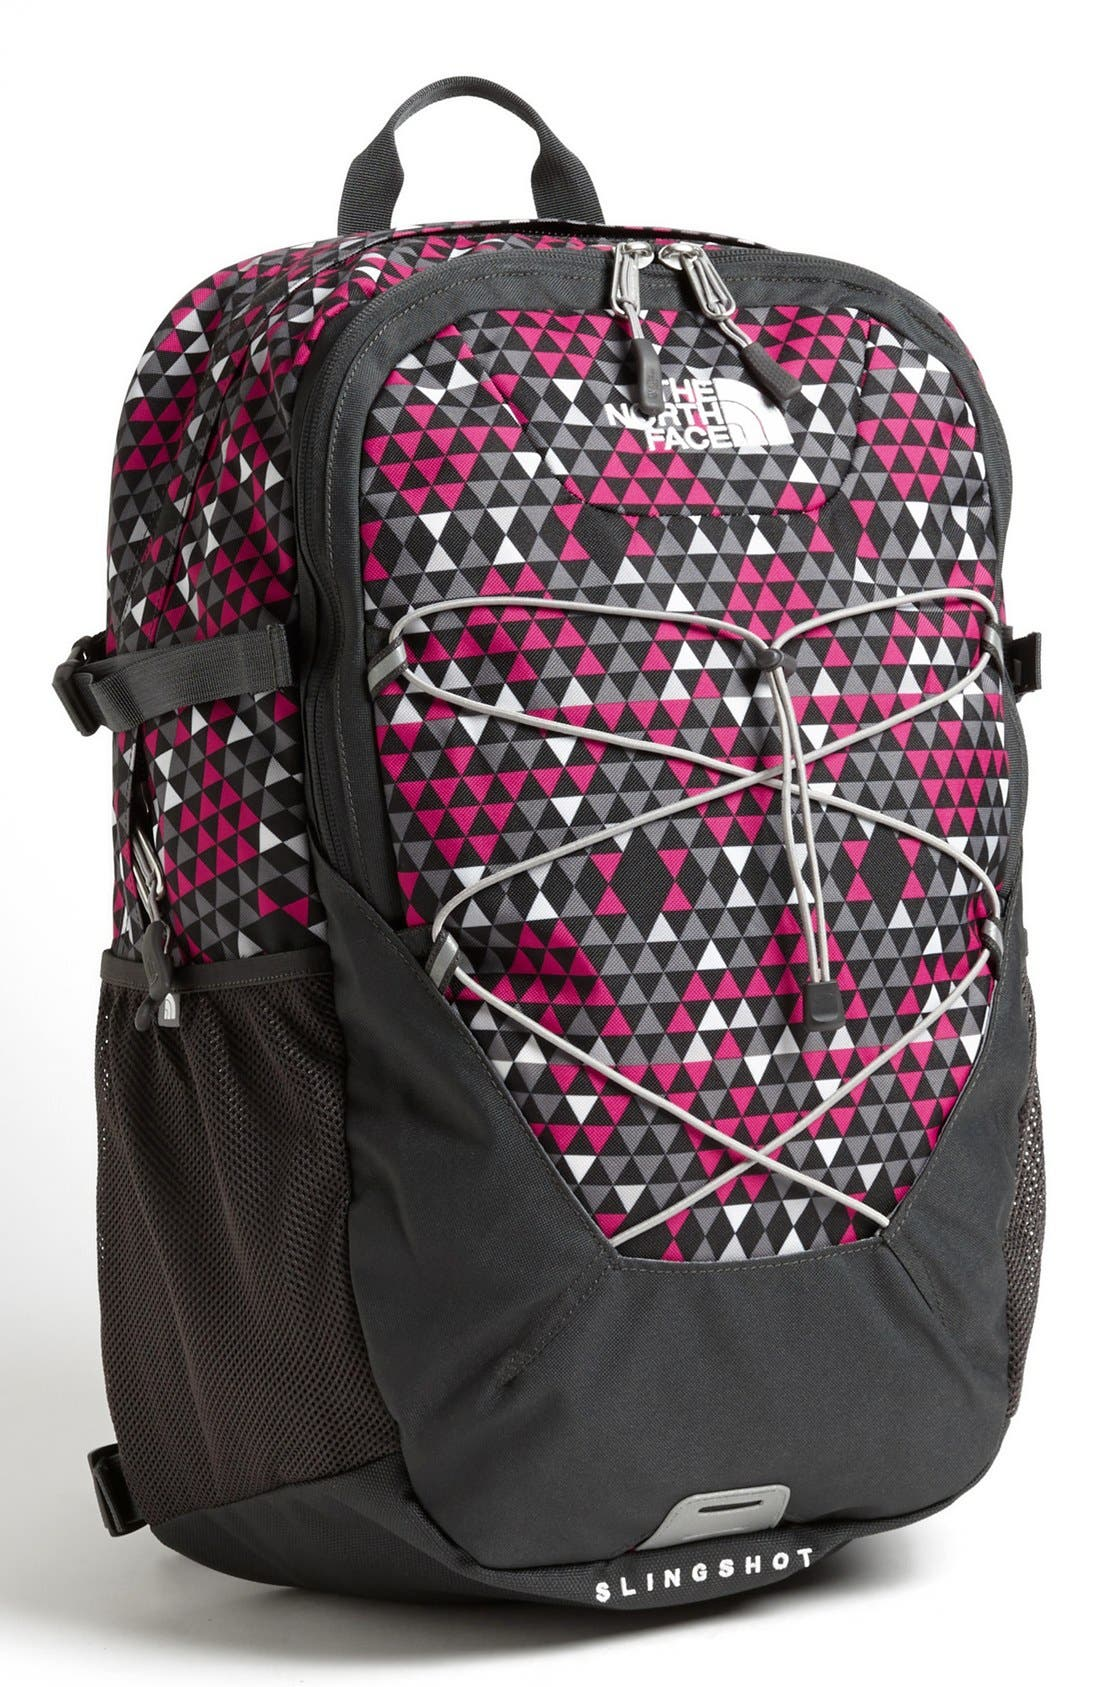 Main Image - The North Face 'Slingshot' Backpack